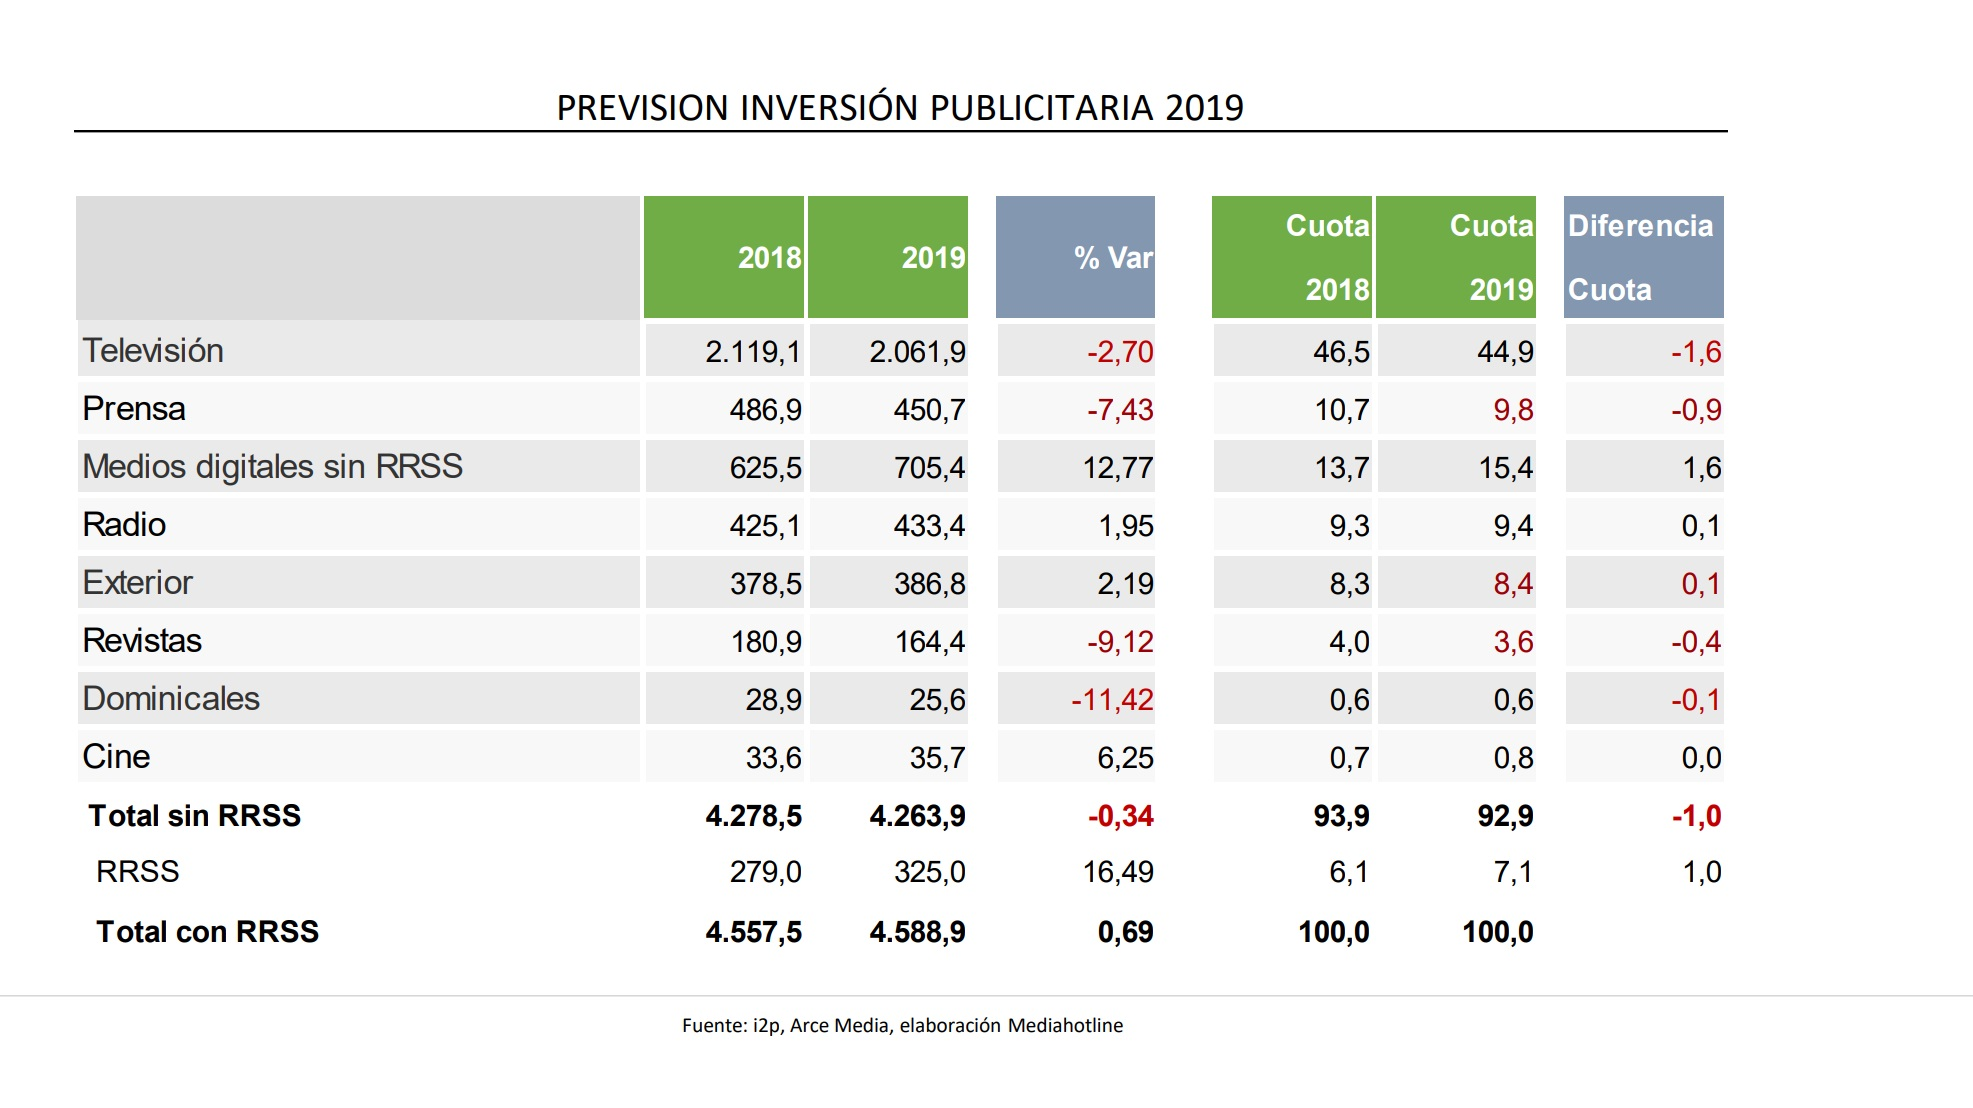 https://www.programapublicidad.com/wp-content/uploads/2019/04/prevision-2019-inversion-publicitaria-i2p-arcemedia-hotline-programapublicidad-muy-grande.jpg